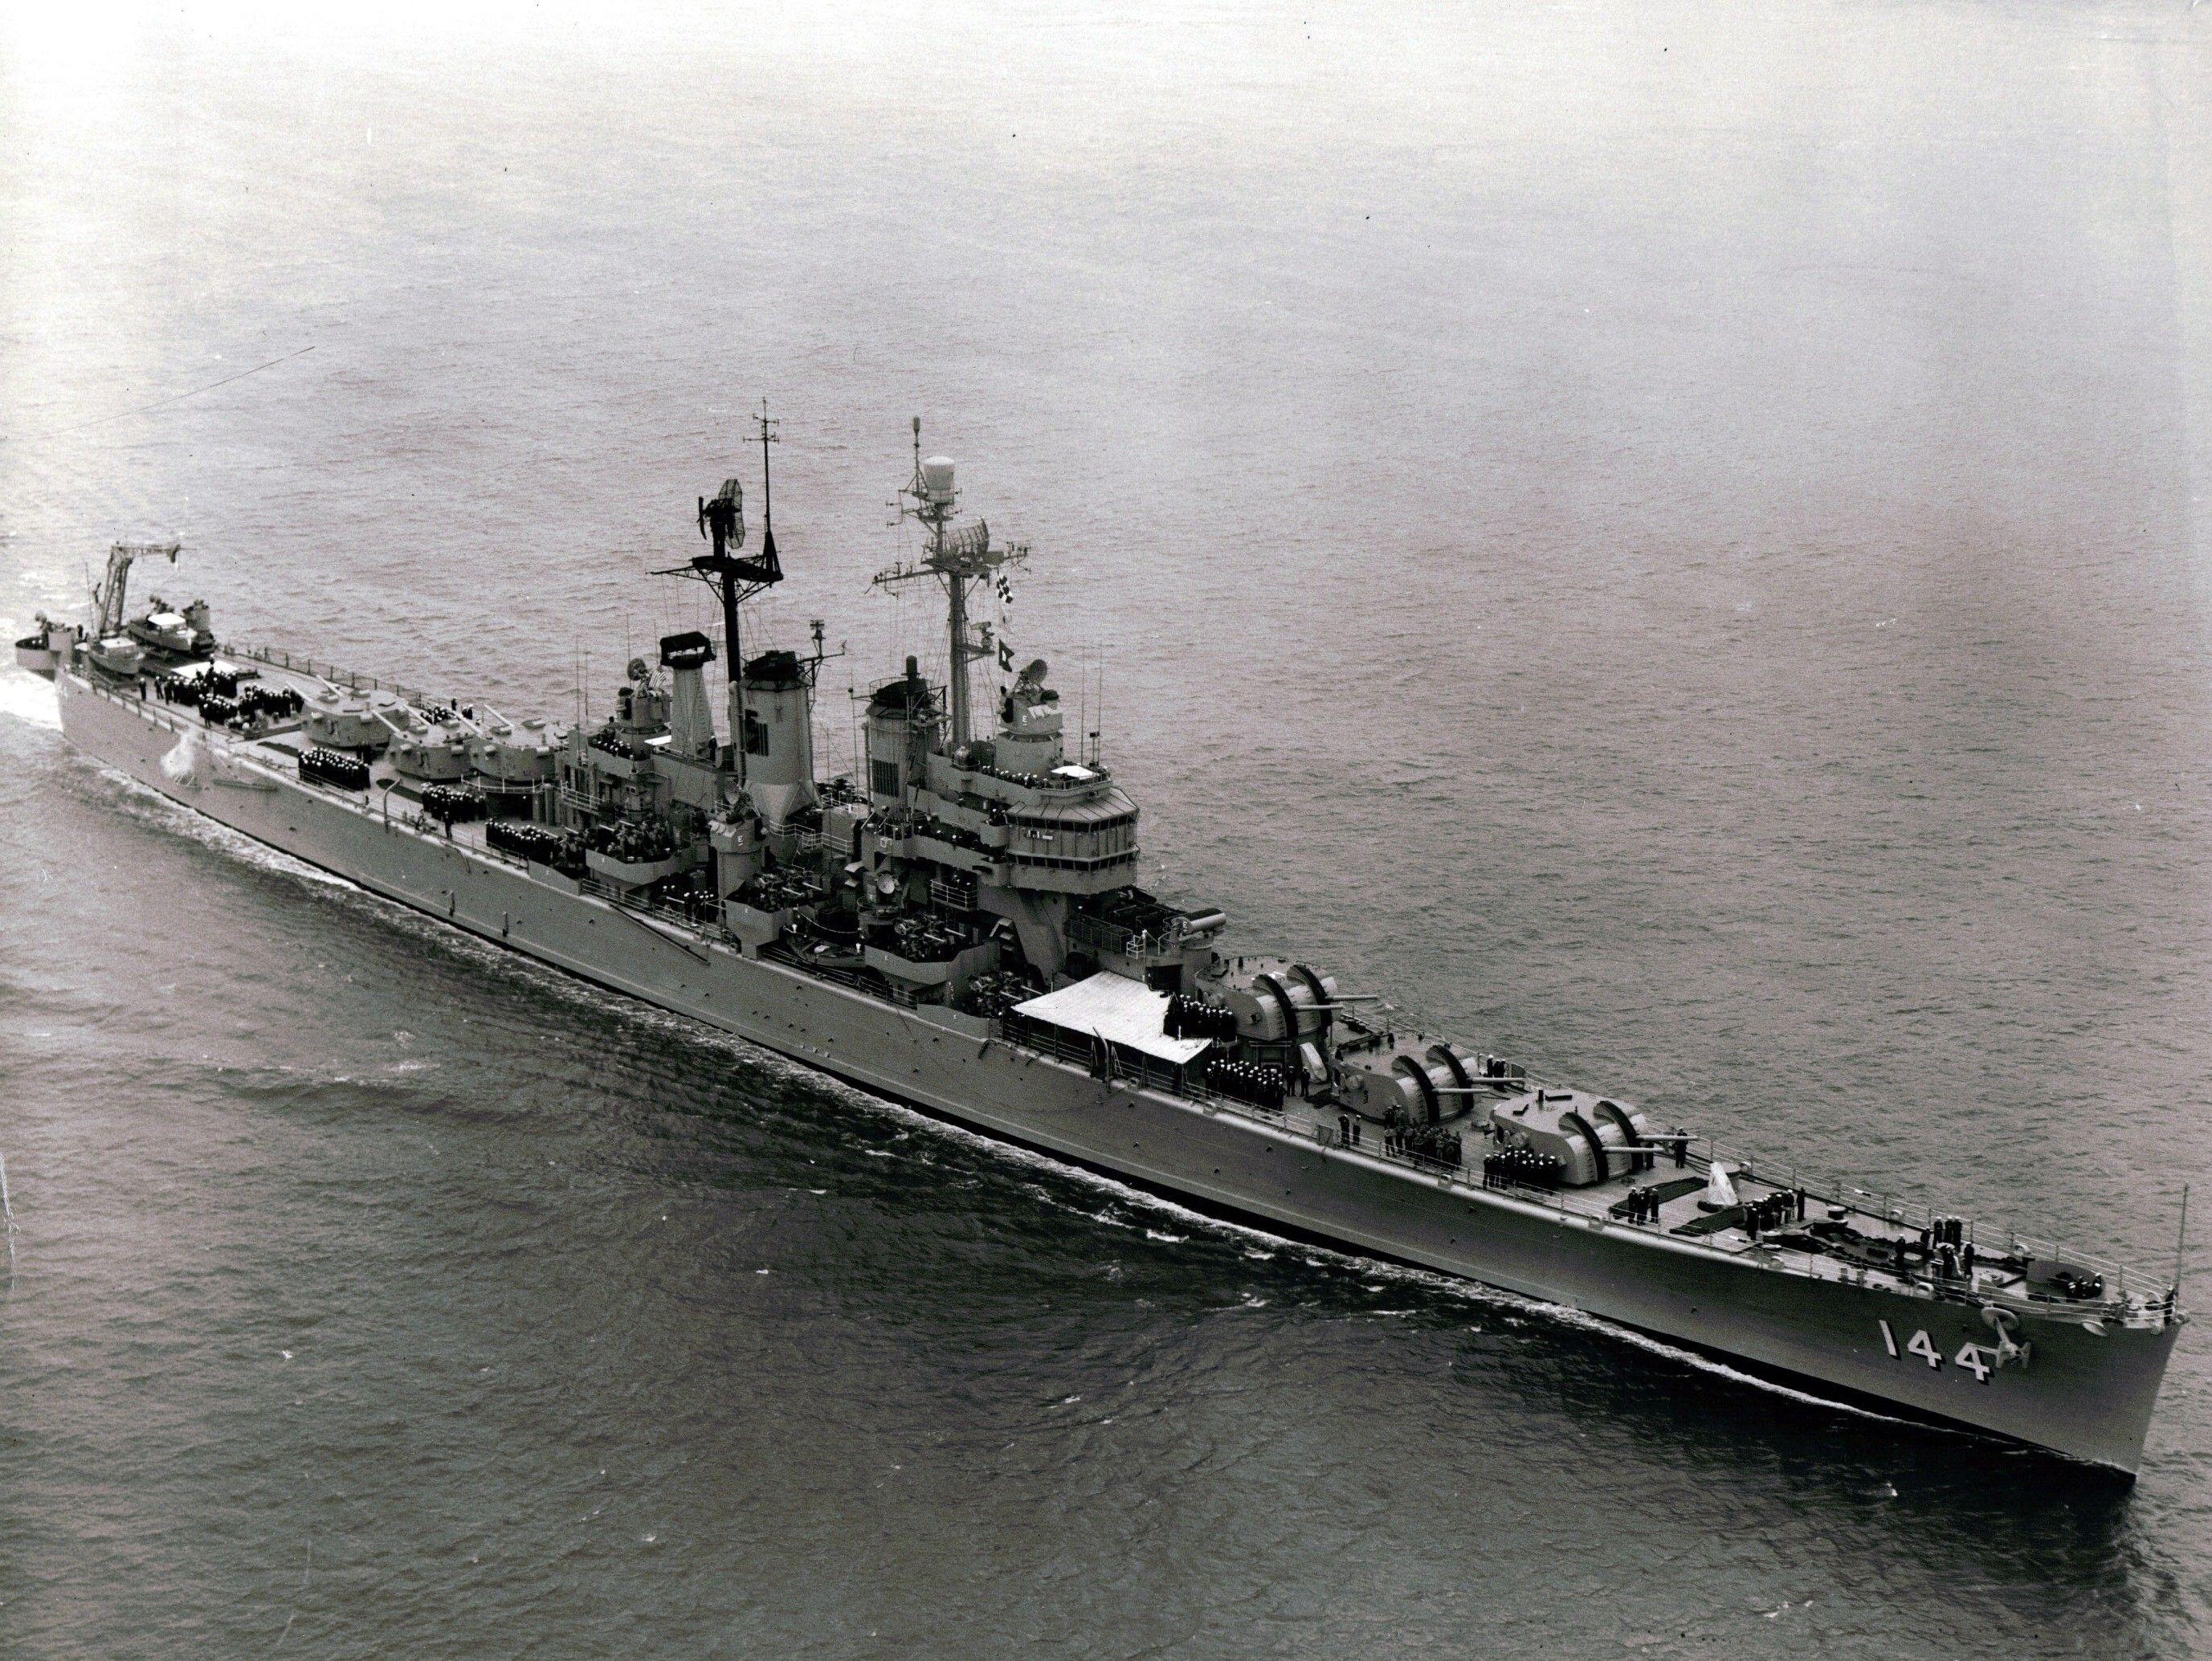 Uss Worcester Cl 144 Warship Battleship Naval History